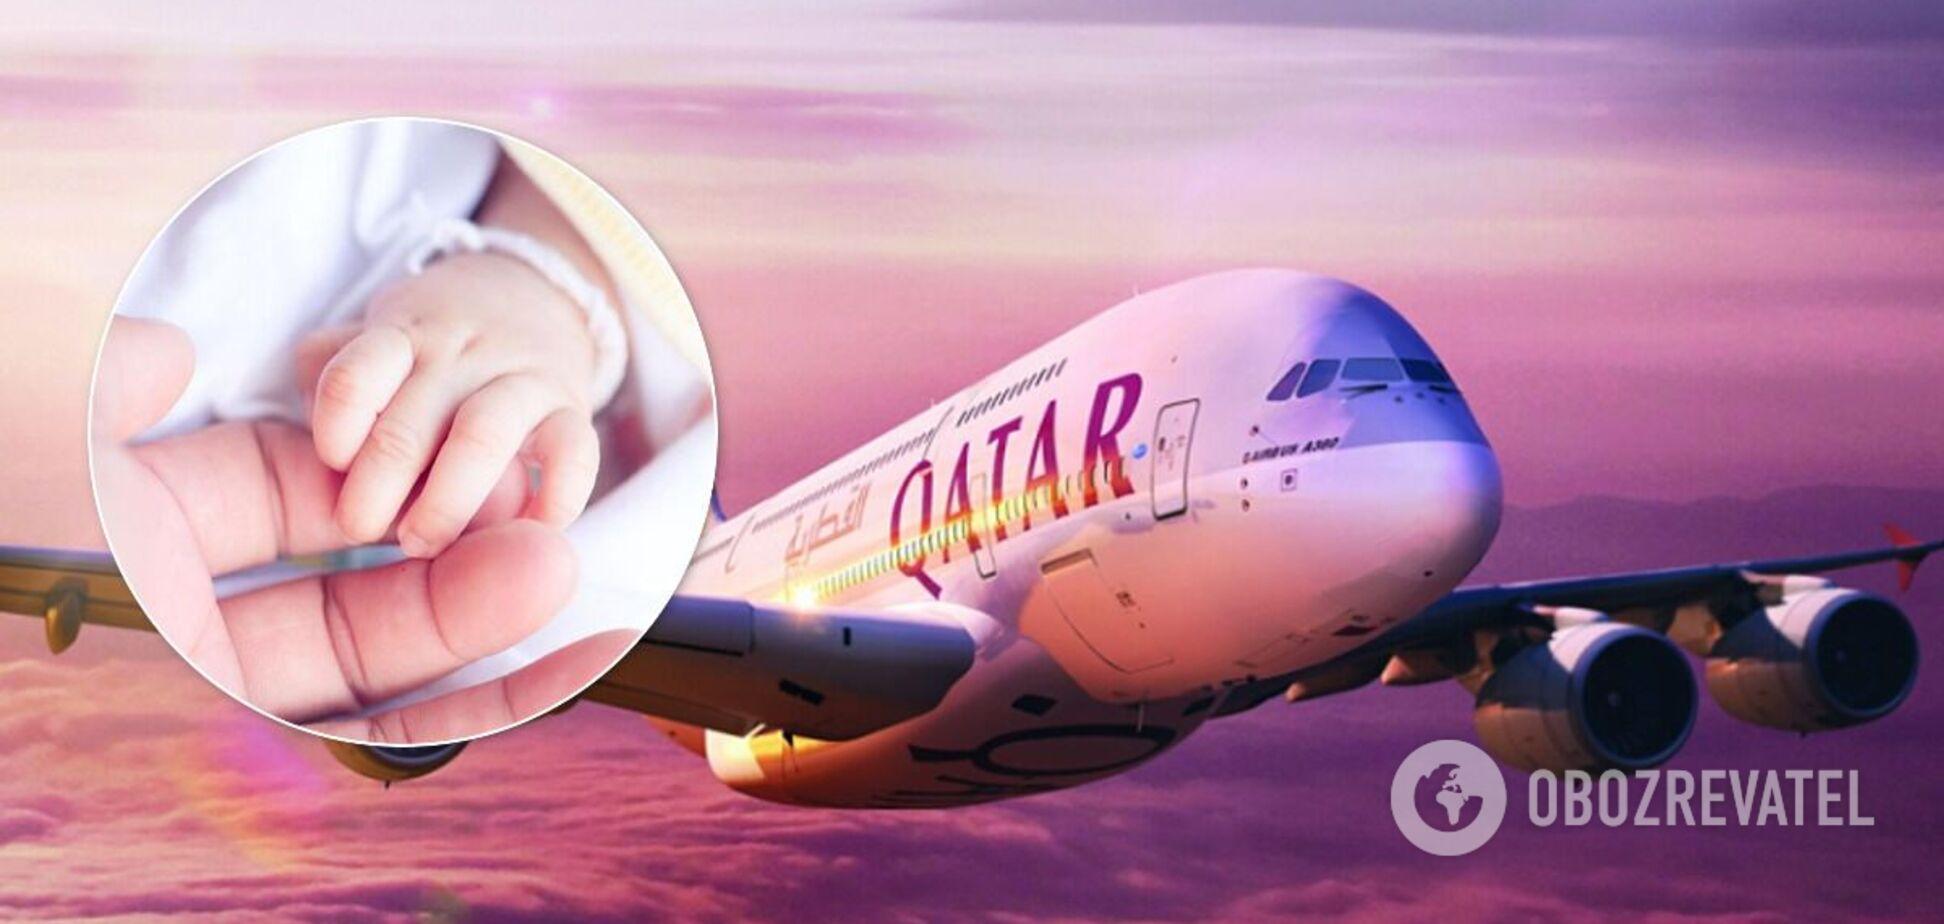 На борту самолета нашли мертвого младенца